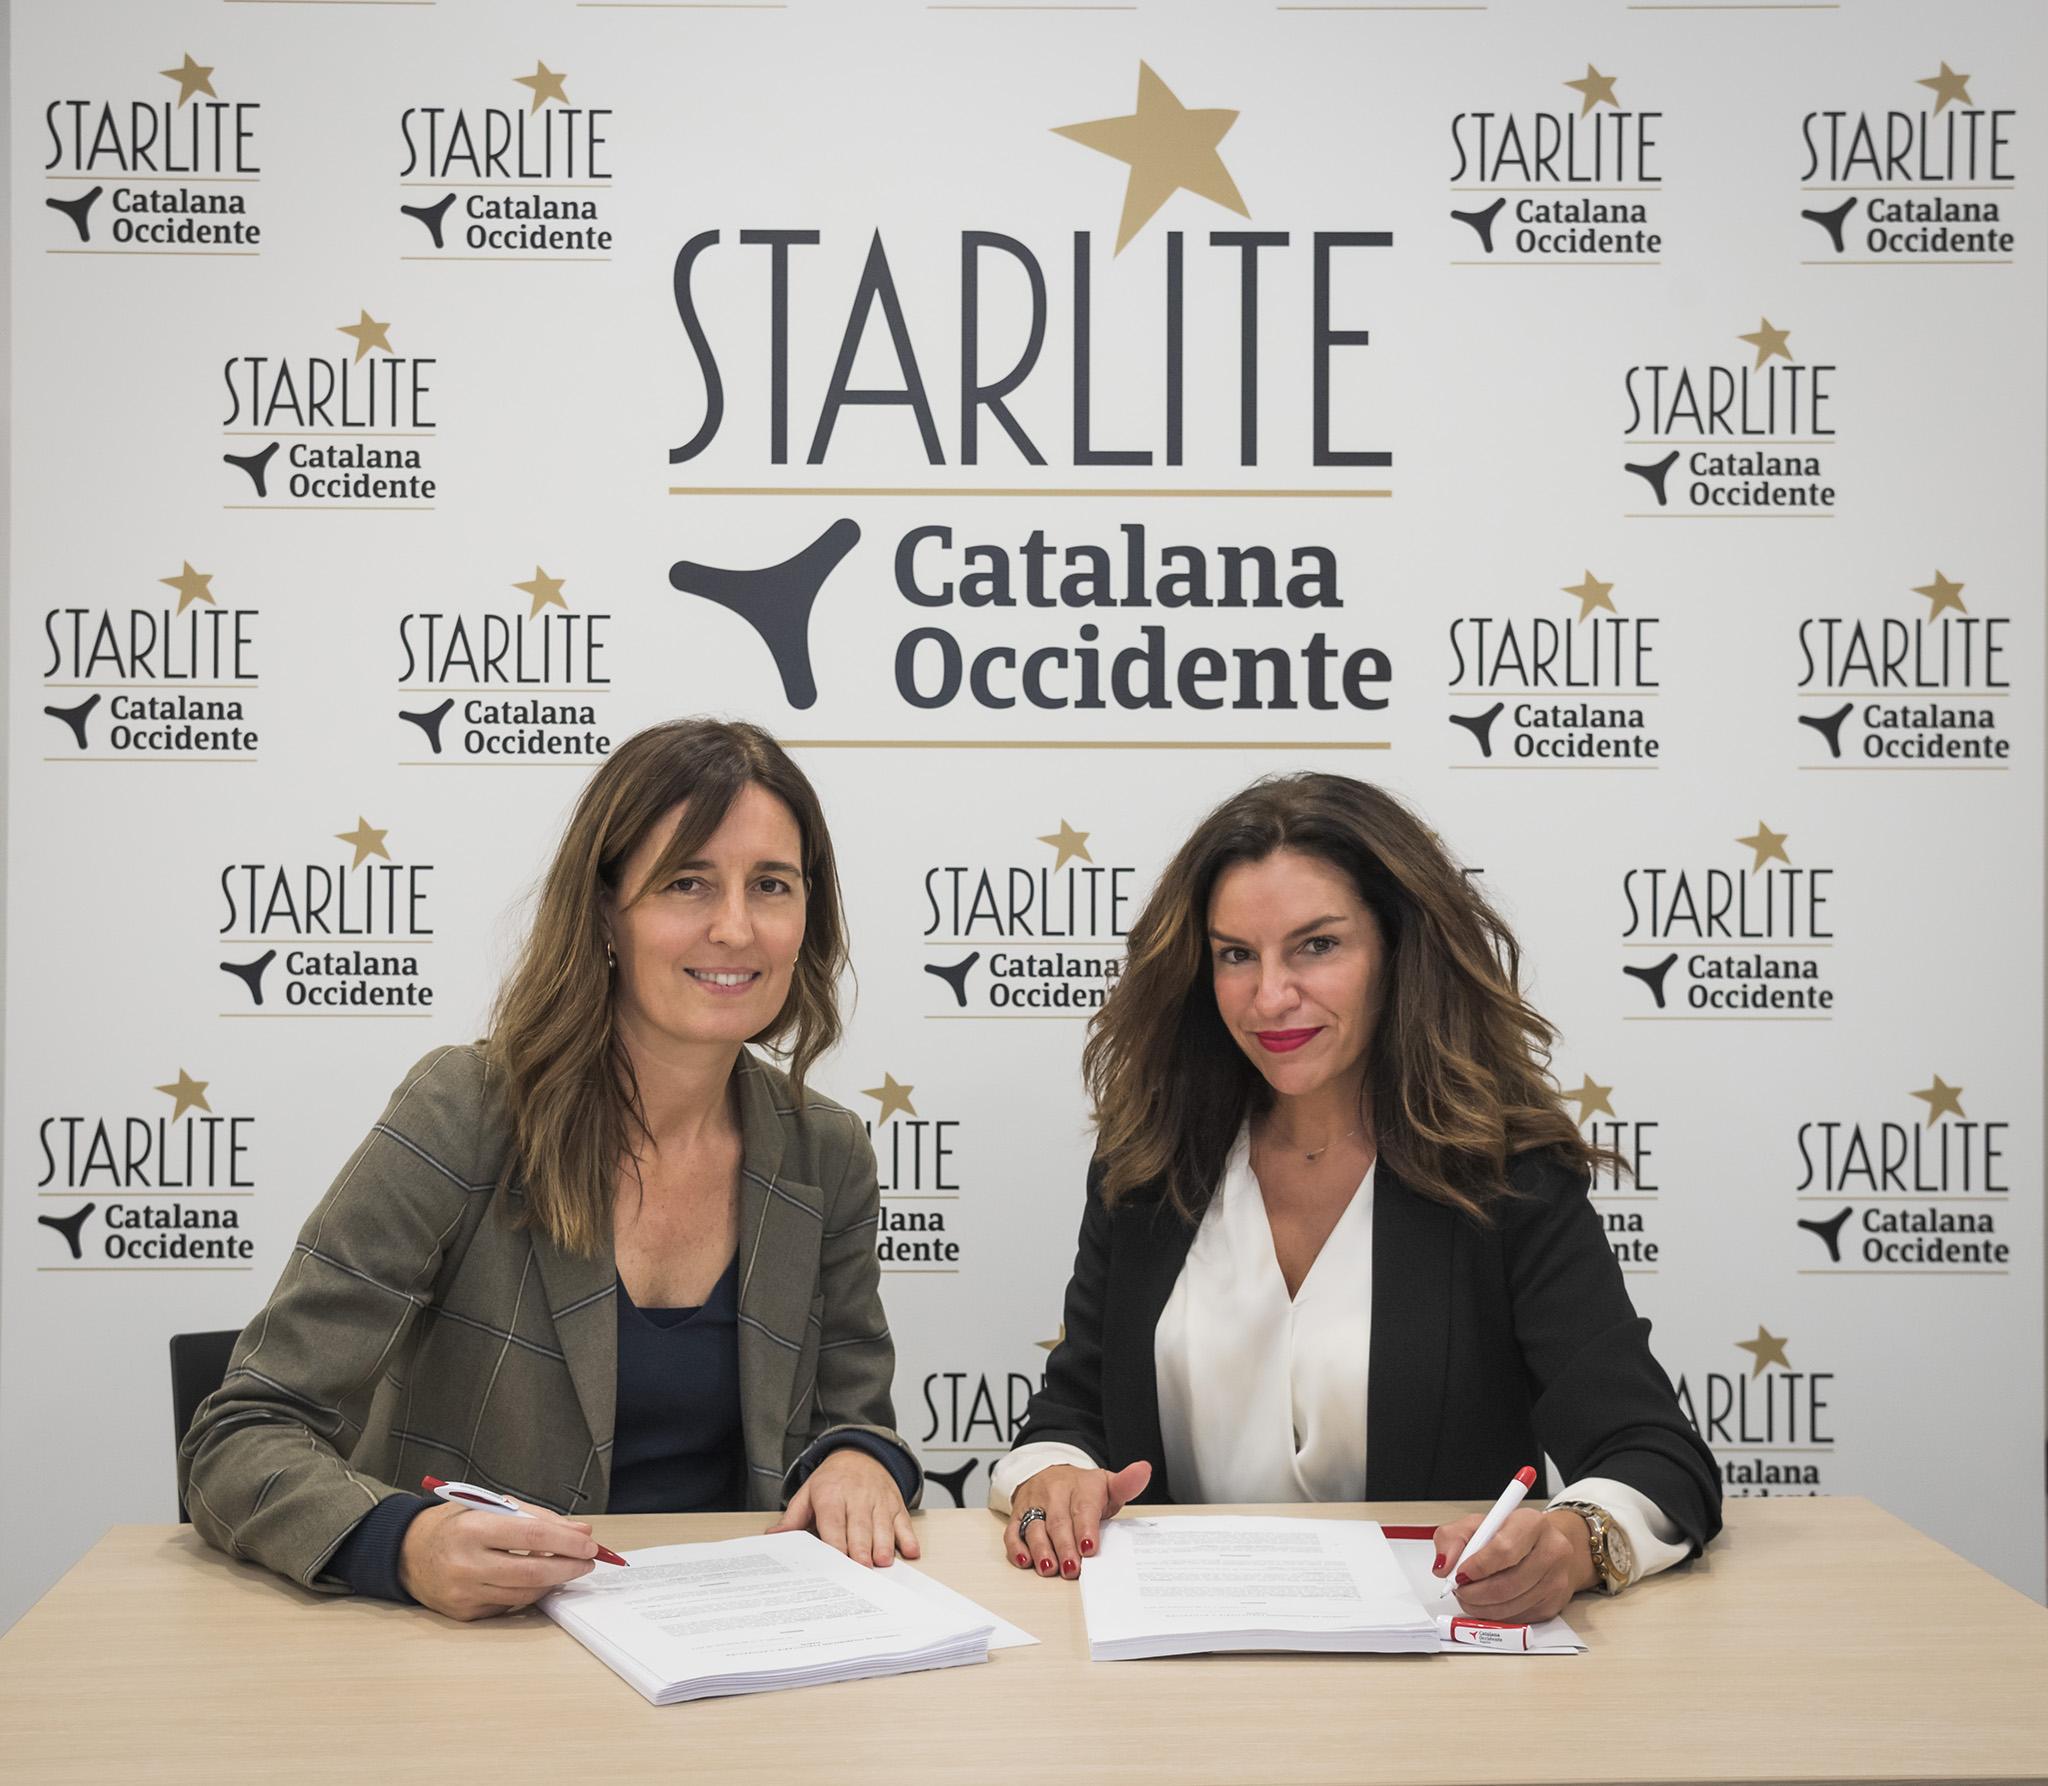 Catalana Occidnete Starlite noticias de seguros